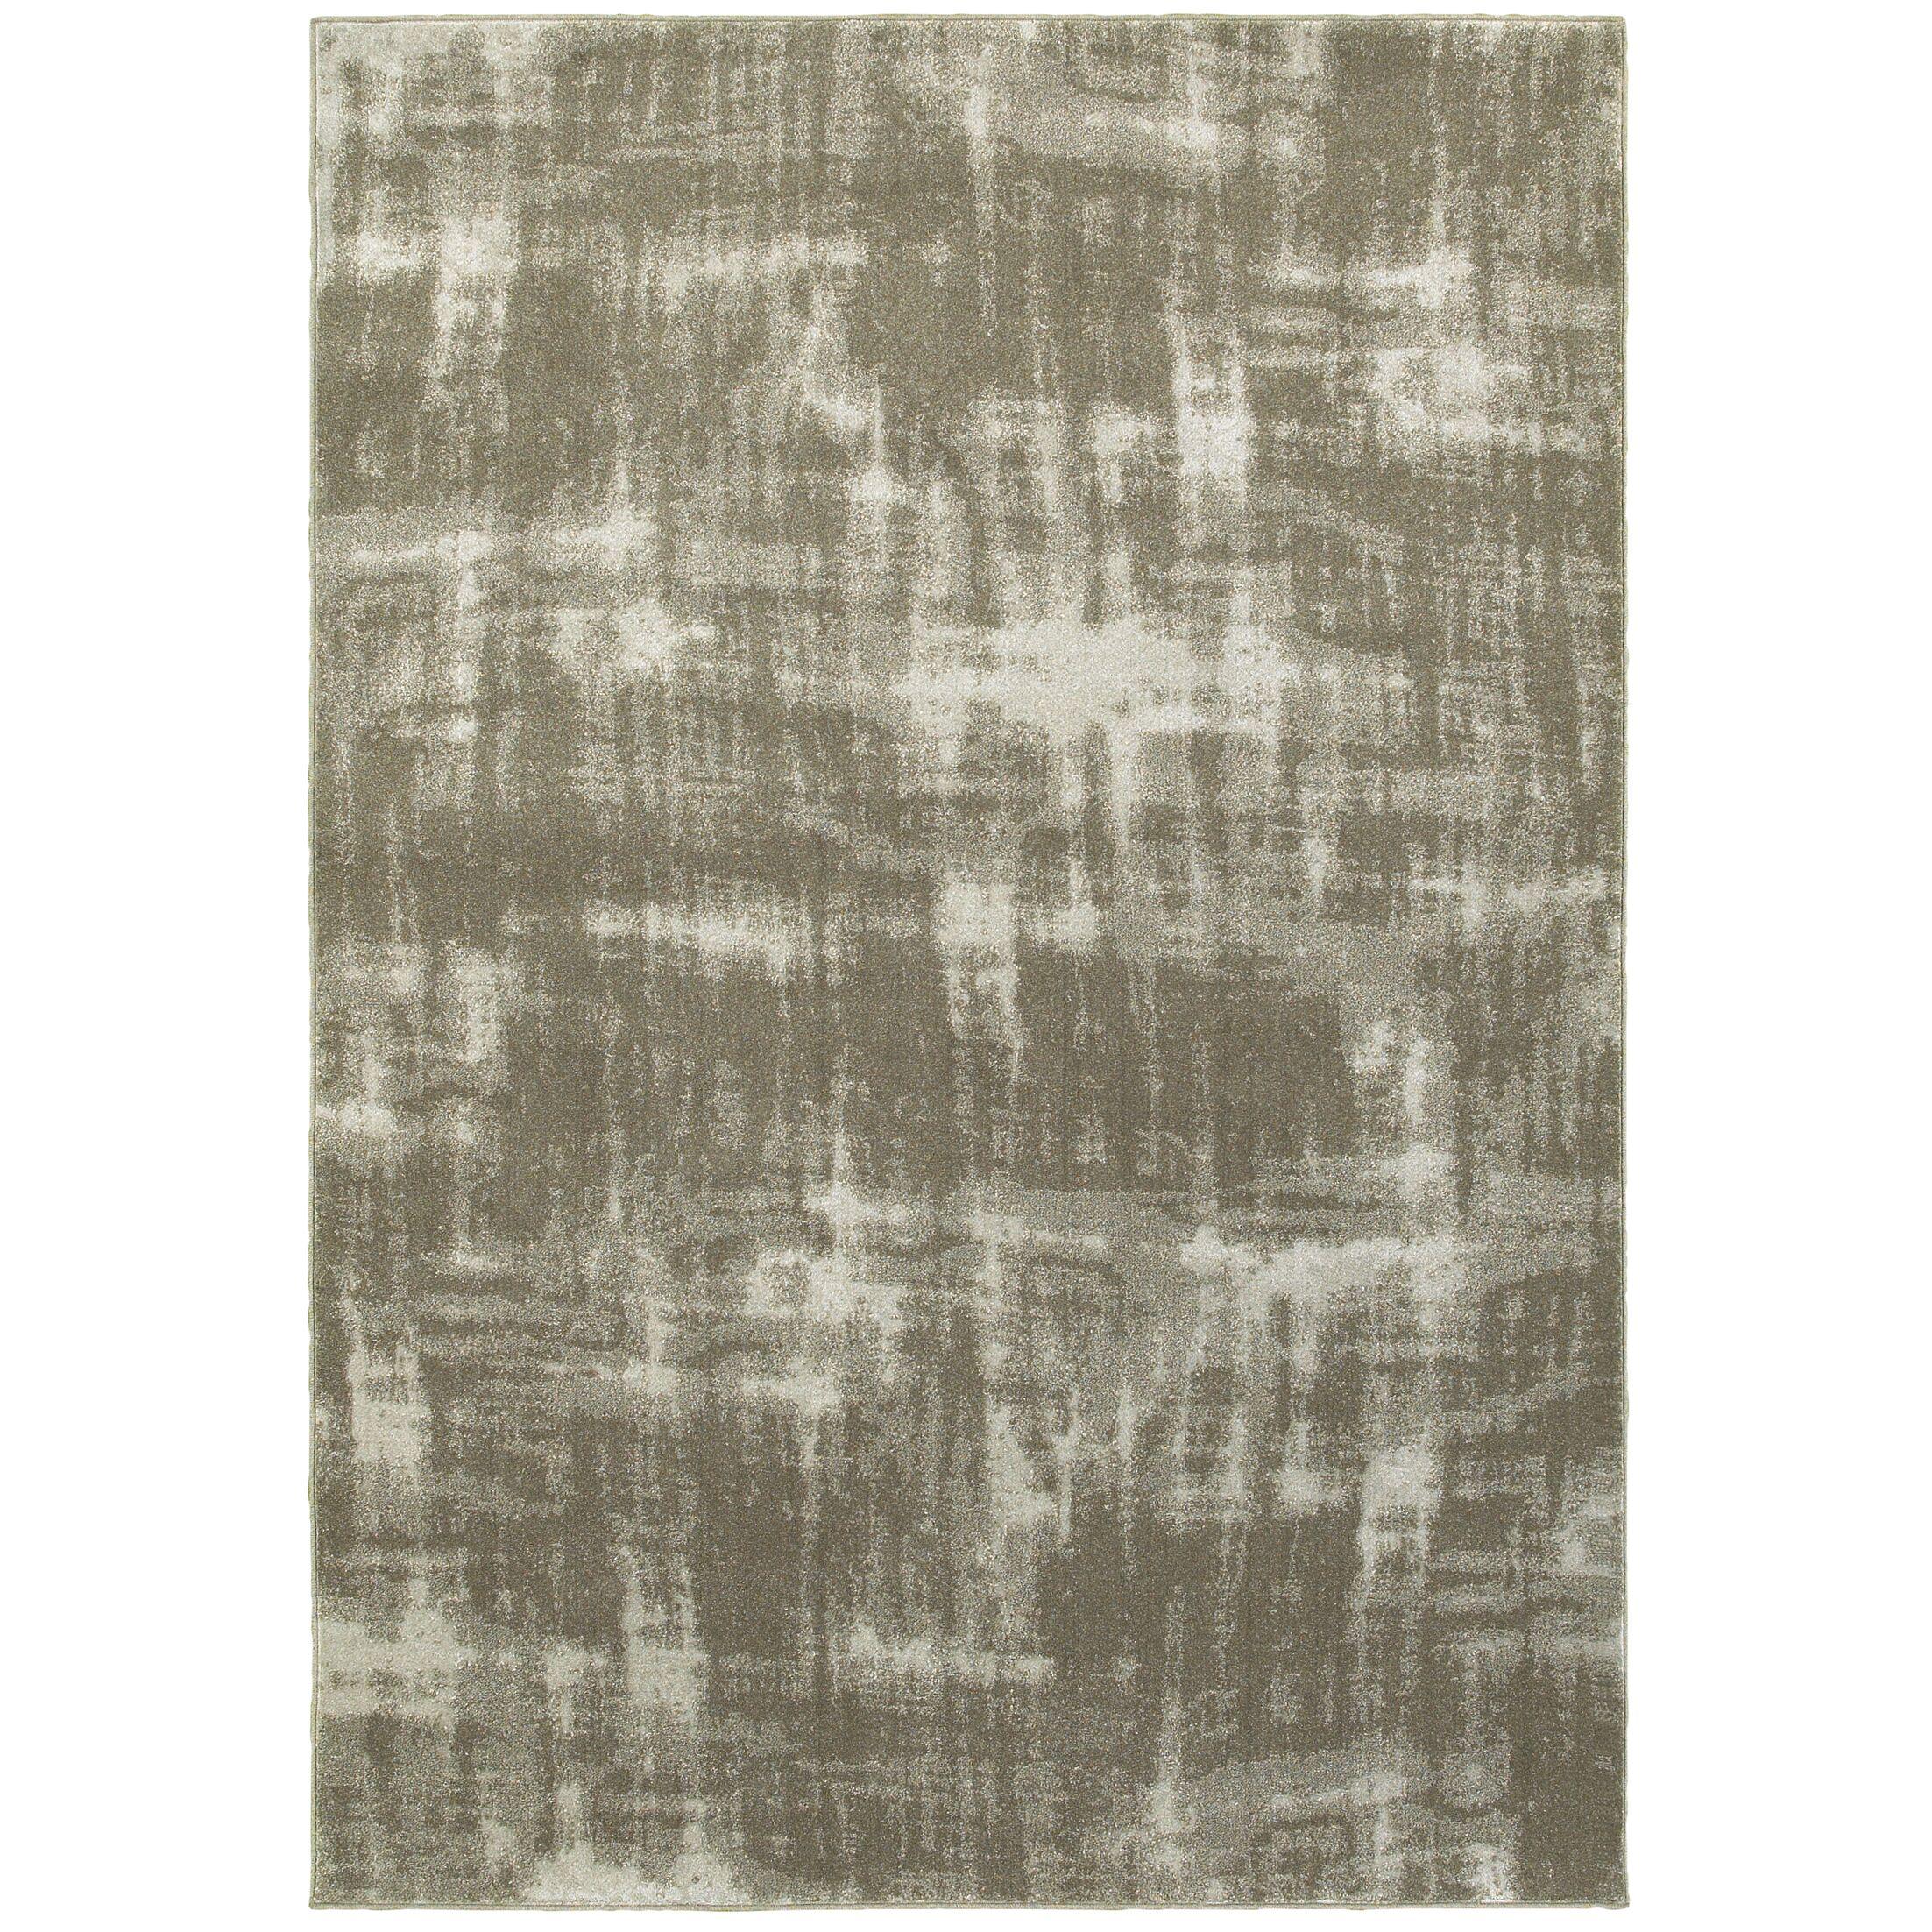 Leonidas Gray/Ivory Area Rug Size: Rectangle 9'10